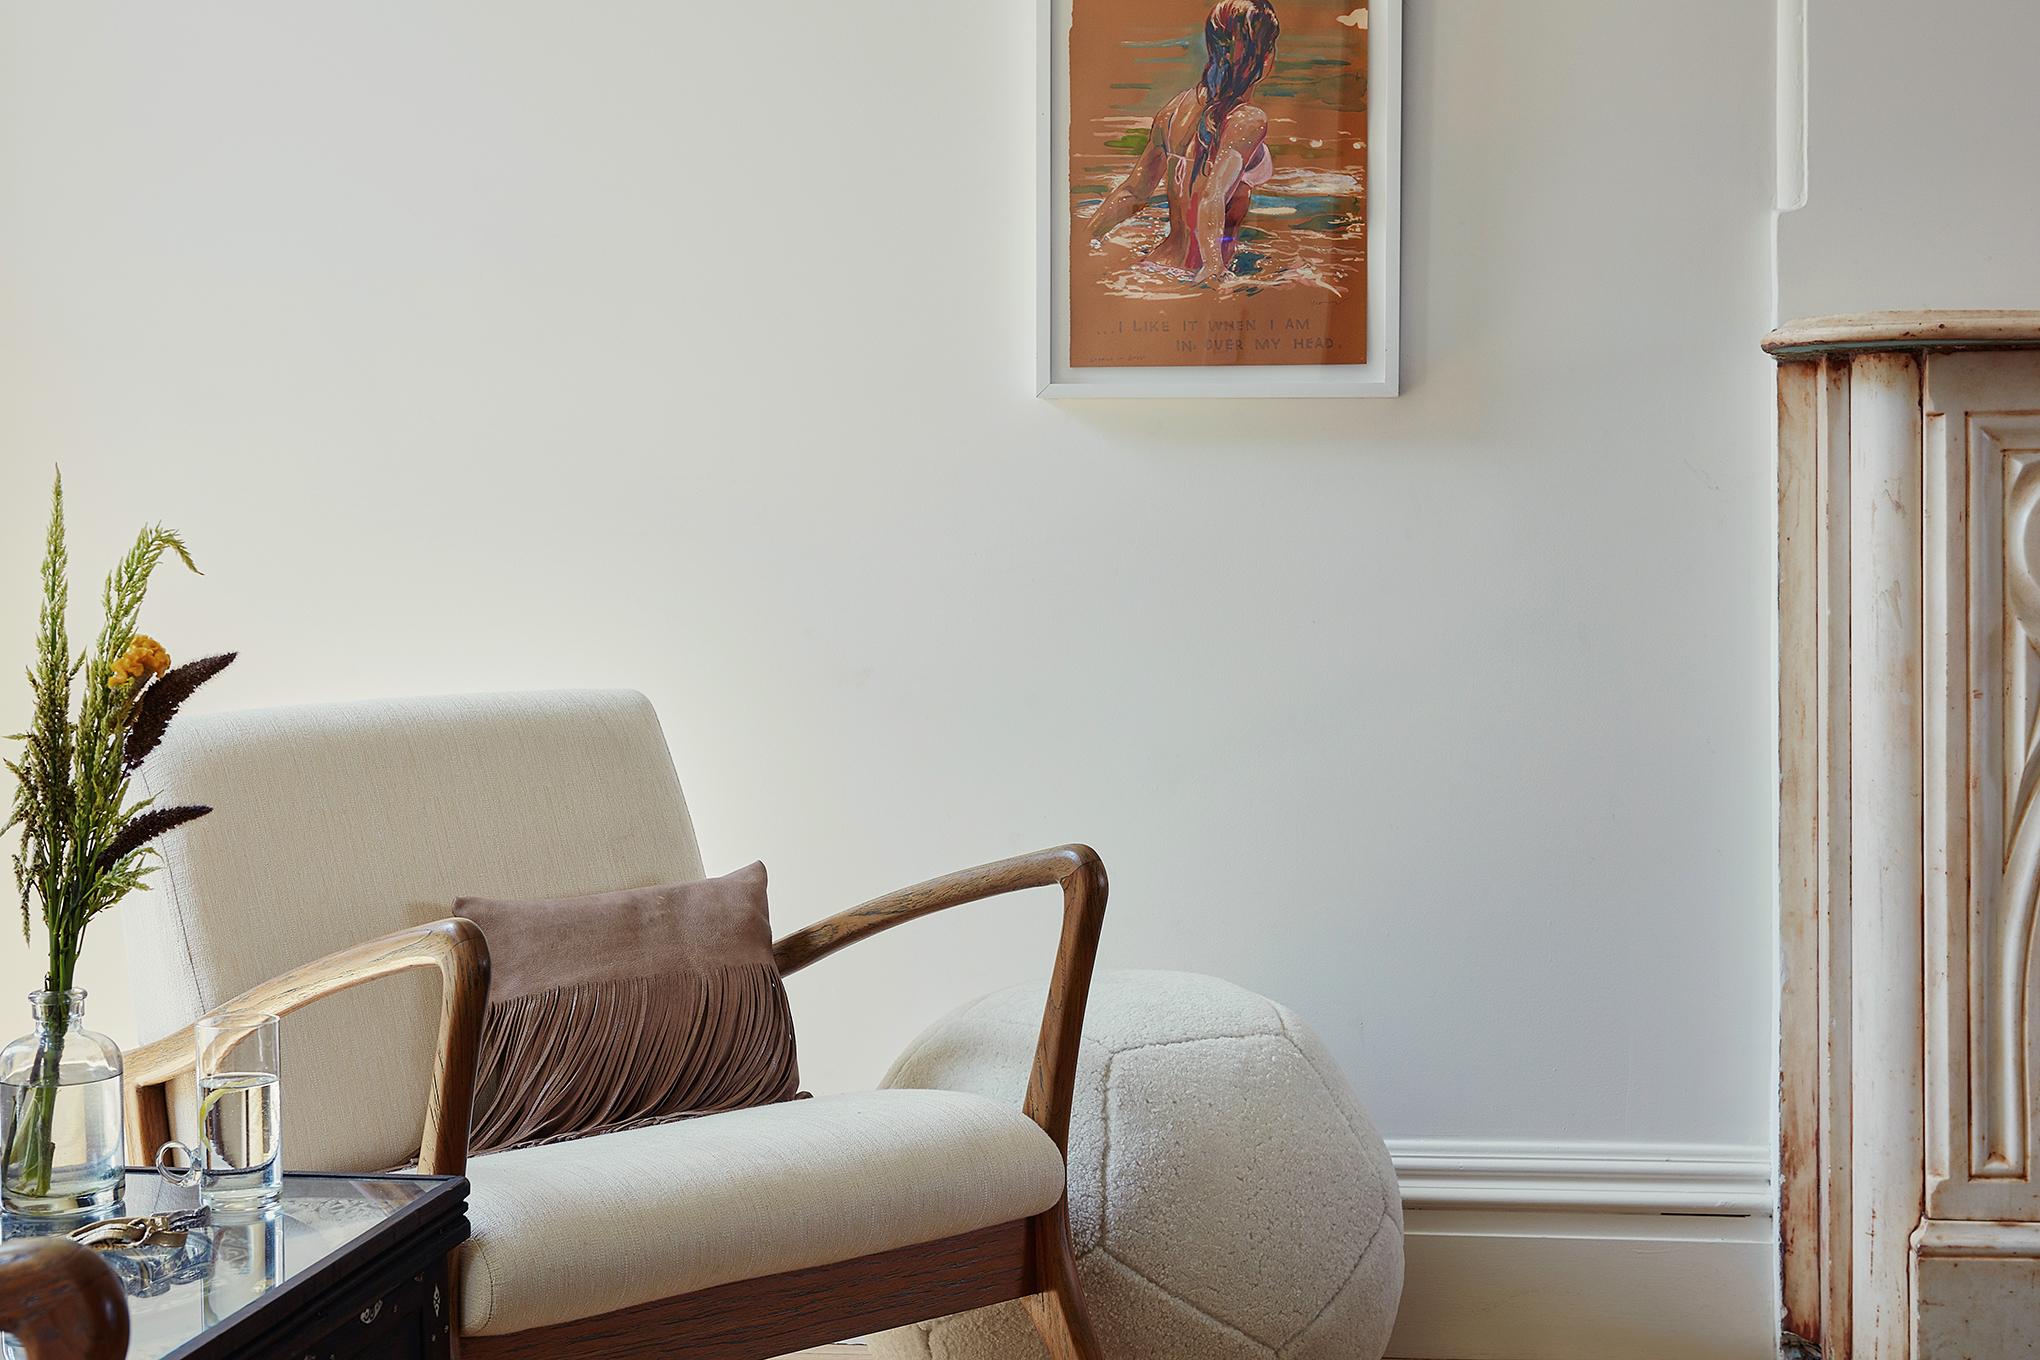 King Ottoman X  in Cream Sheepskin, and  Fringe Pillow  in Taupe Leather : Nicole Watts Studio - Park Slope Townhouse | Photo: Josephine Rozman